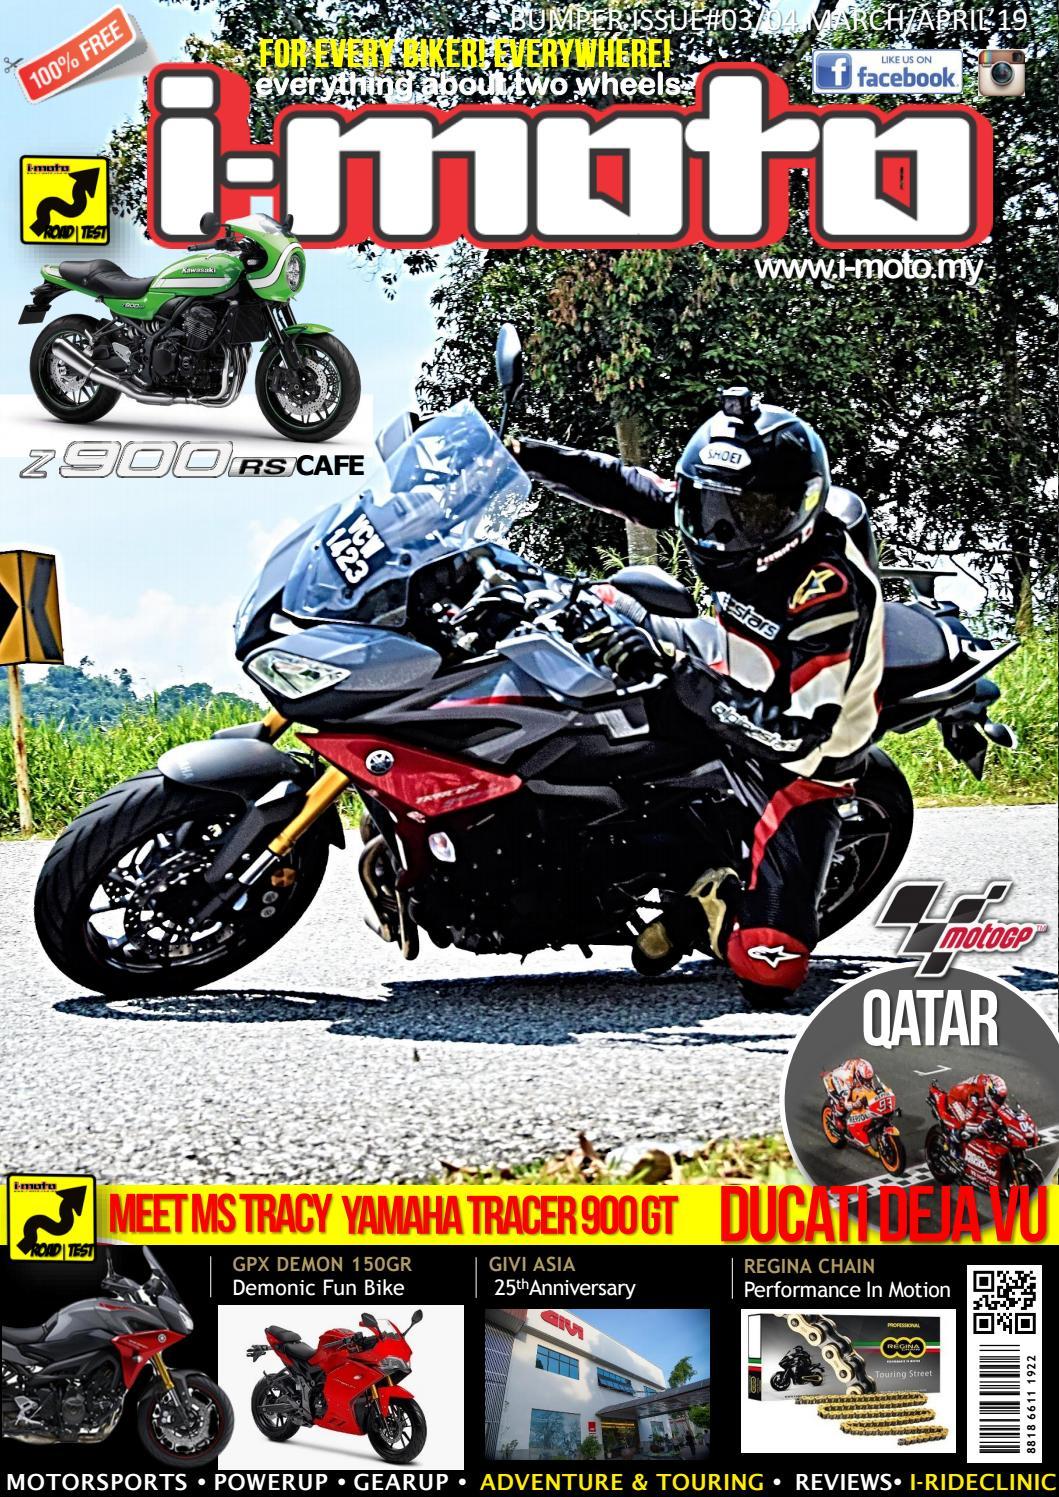 Aprilia Stripes inspired  T shirt Motorbike Racing Biker Moto Rsv4 Racer